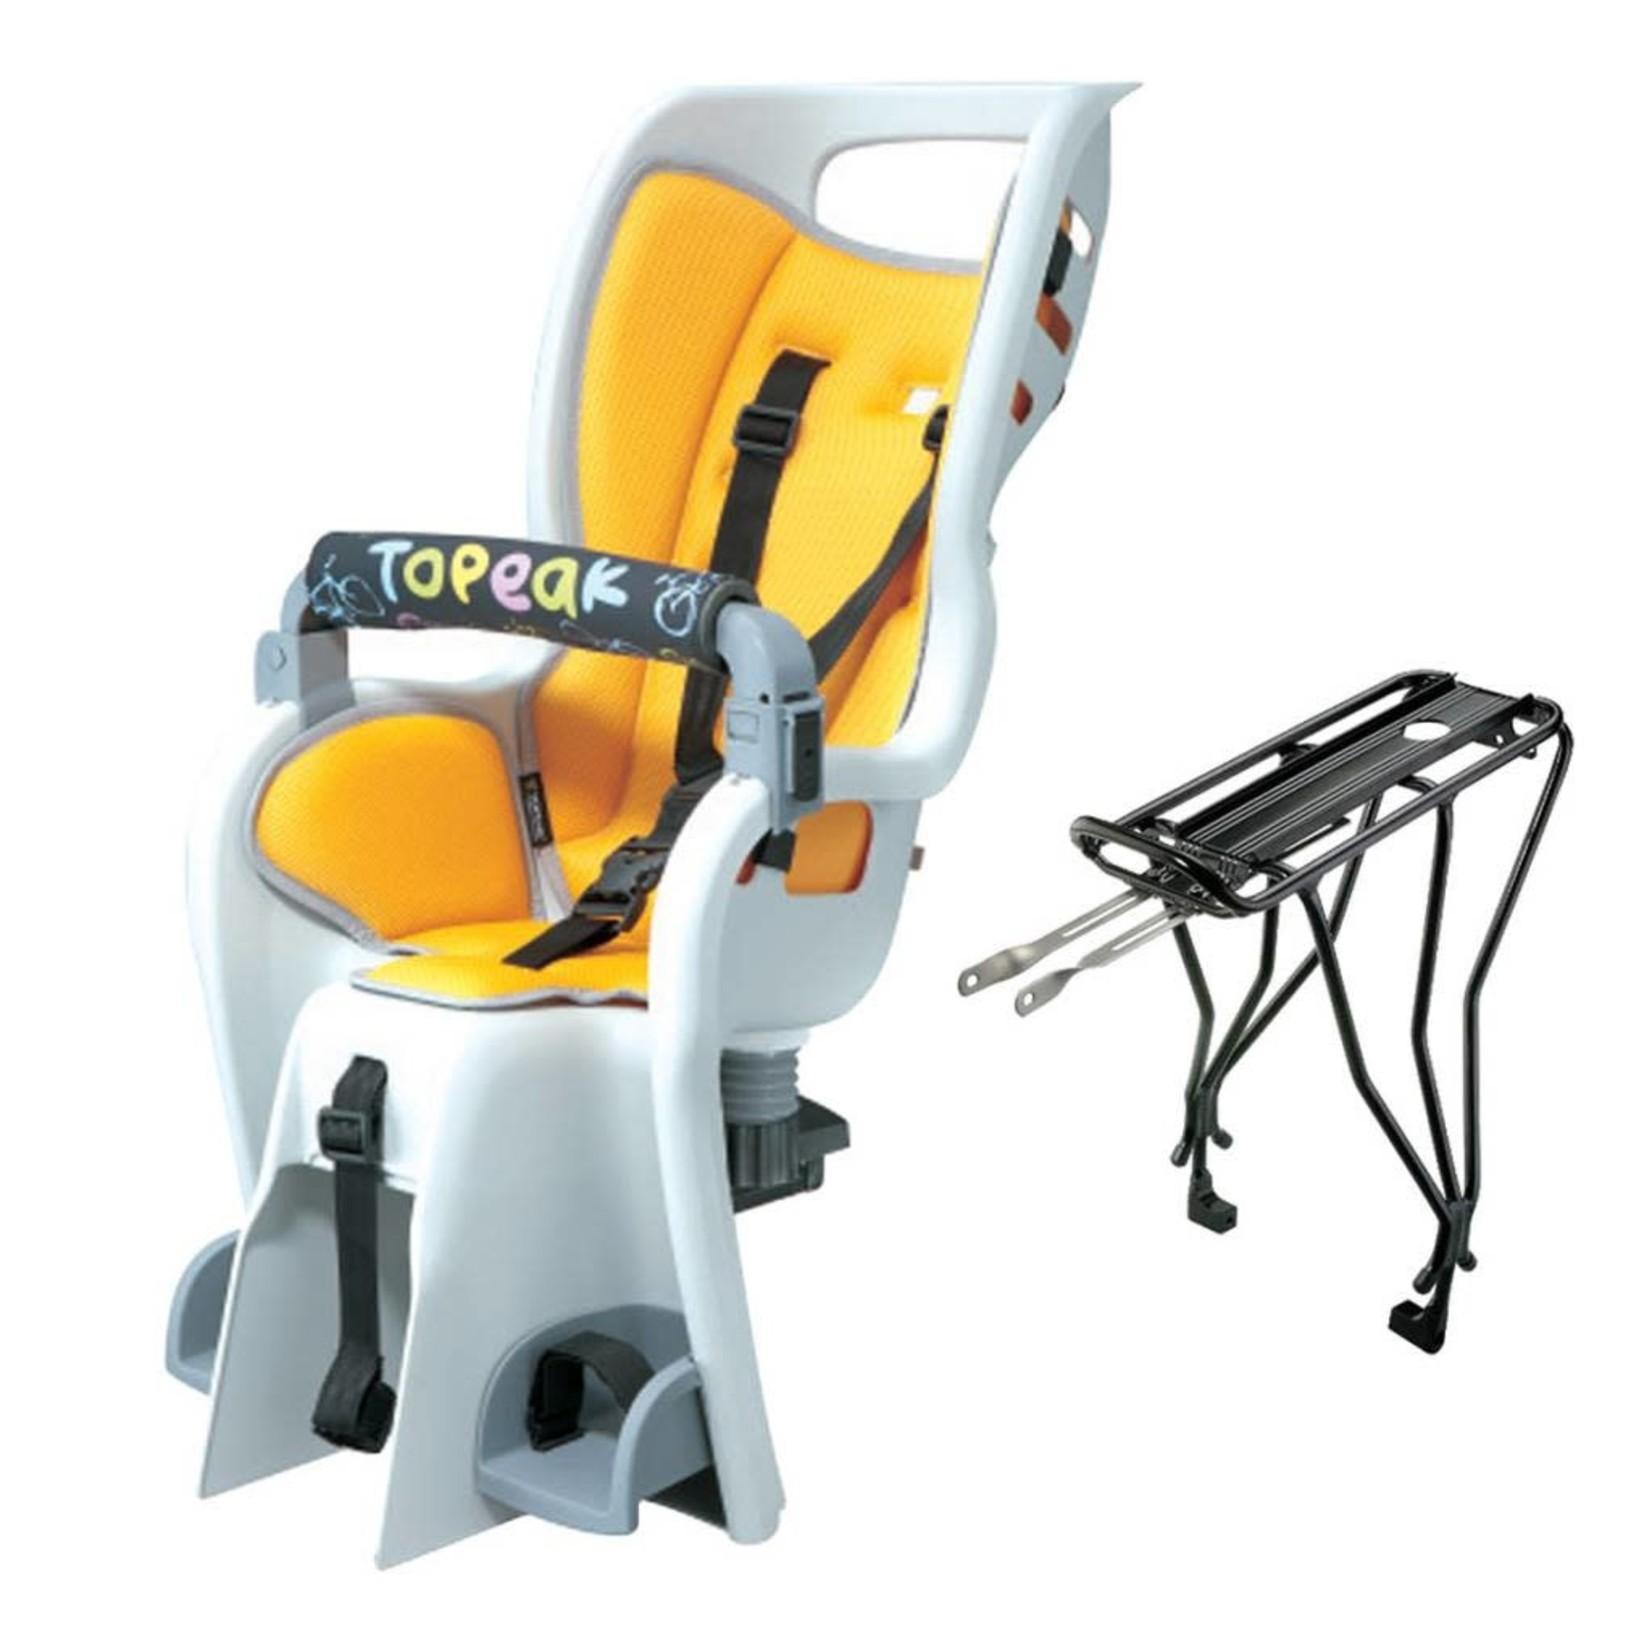 Topeak Topeak BabySeat II with Disc Compatible Rack